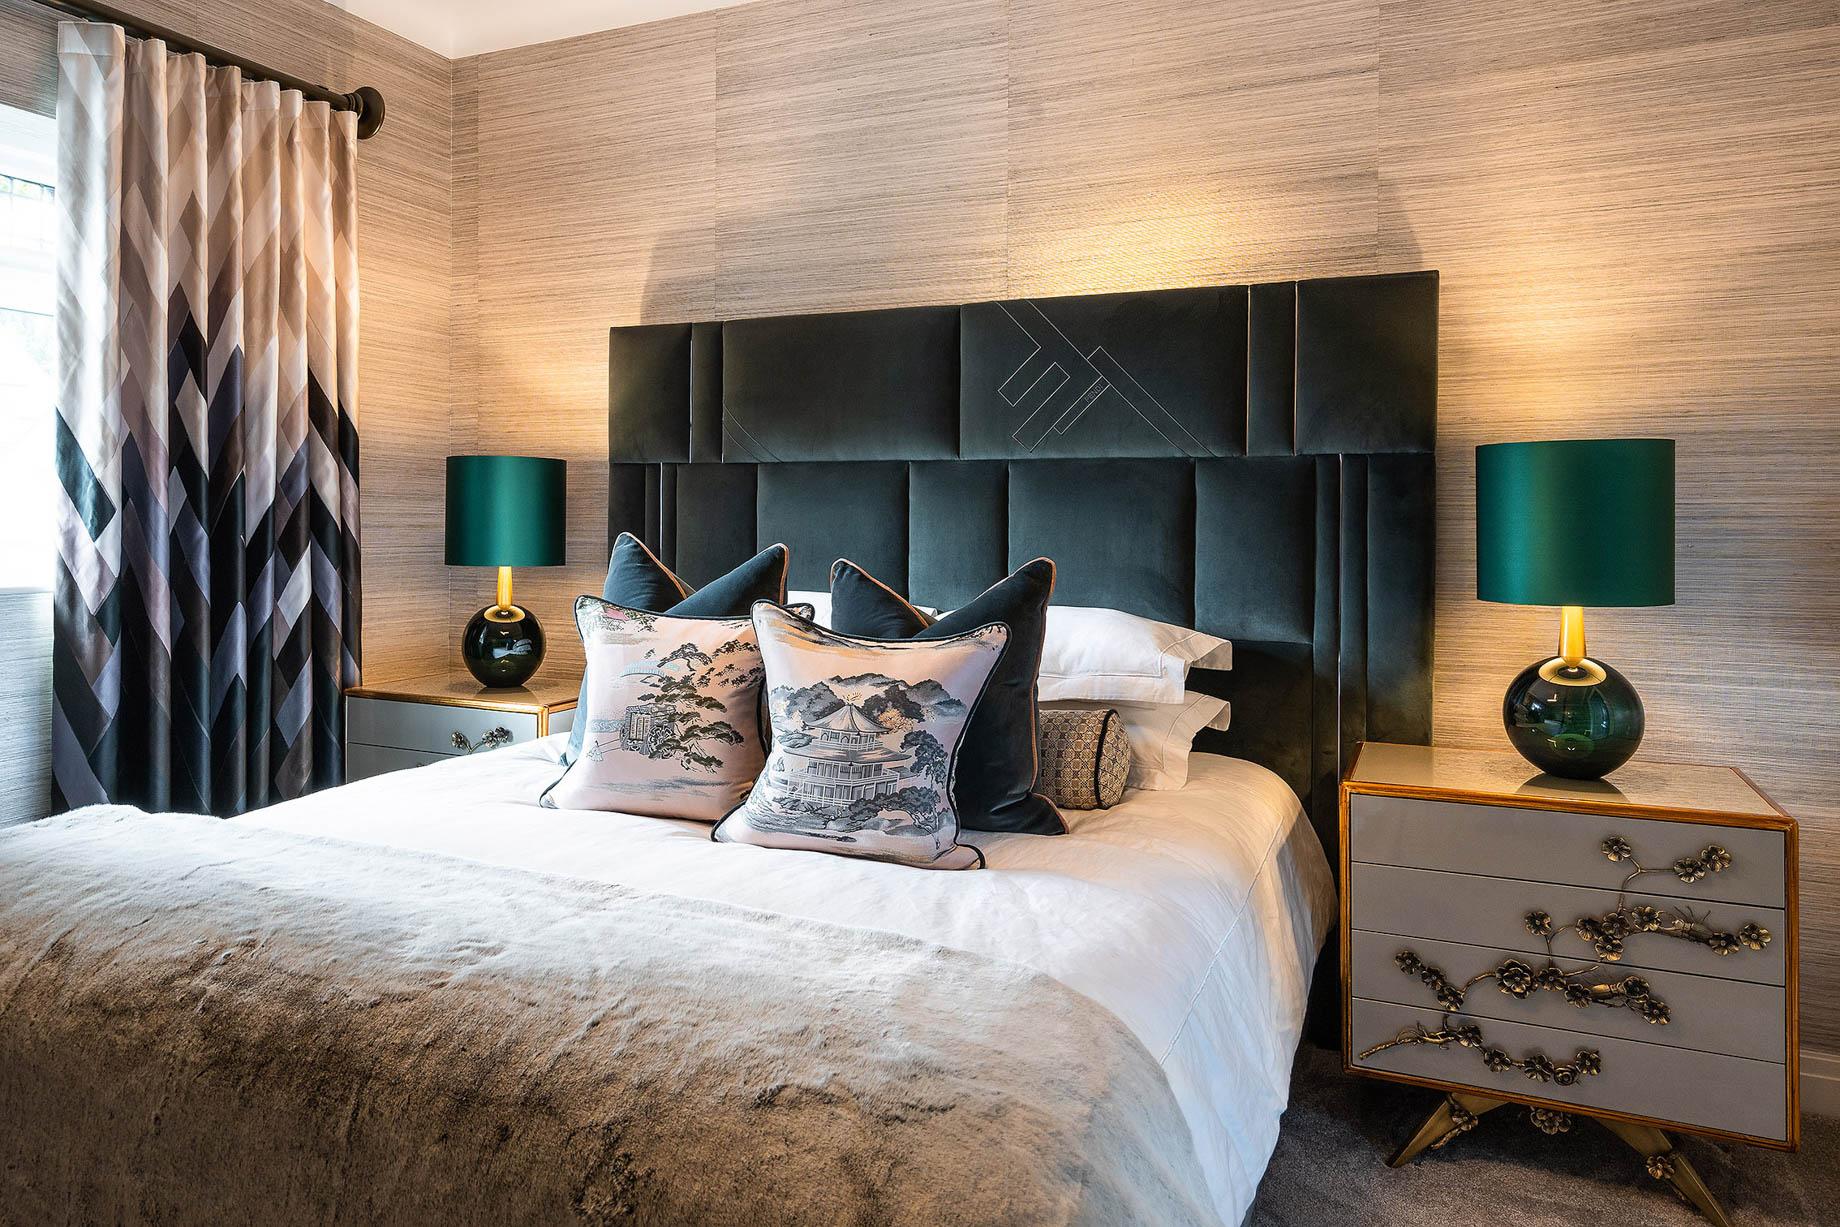 Kensington Home Interior Design London, UK - Kris Turnbull